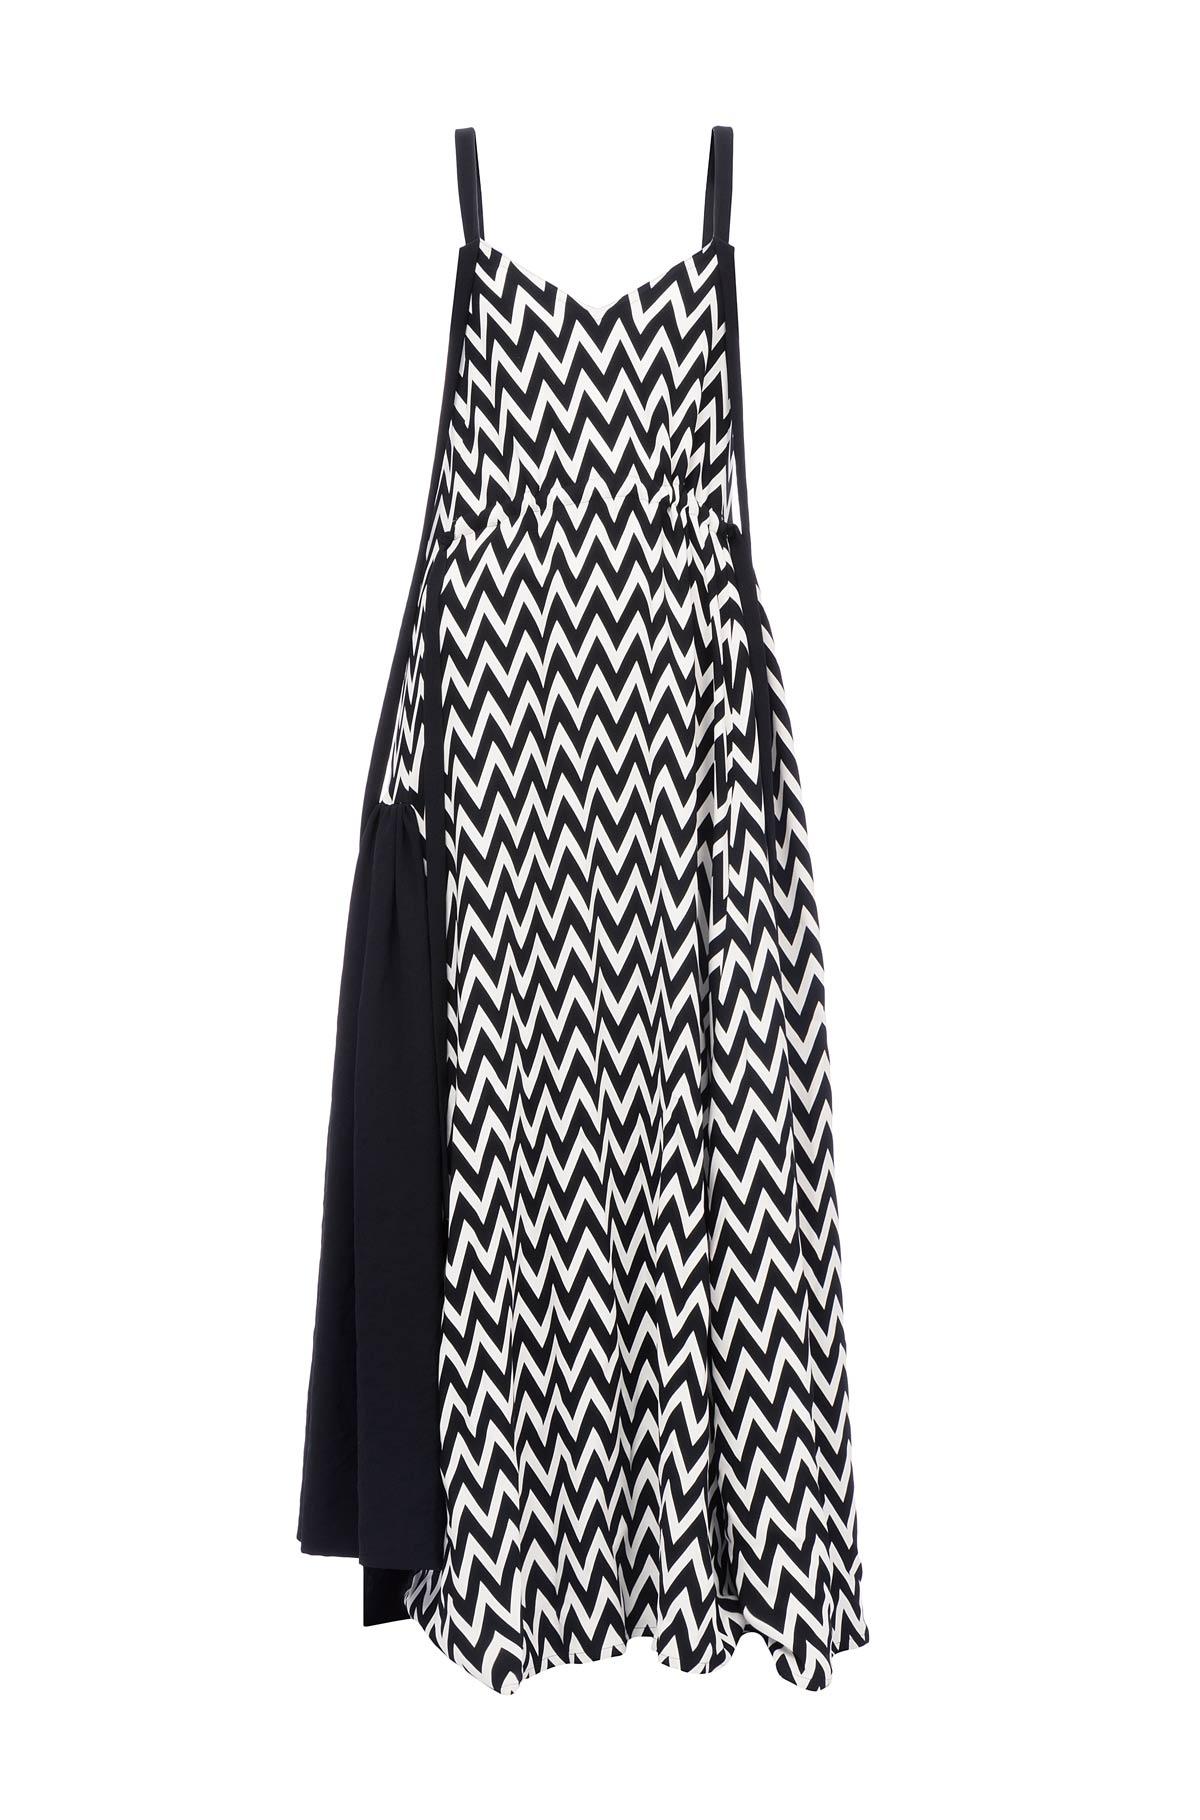 LOEWE Herringbone Camisole Dress Black/White front